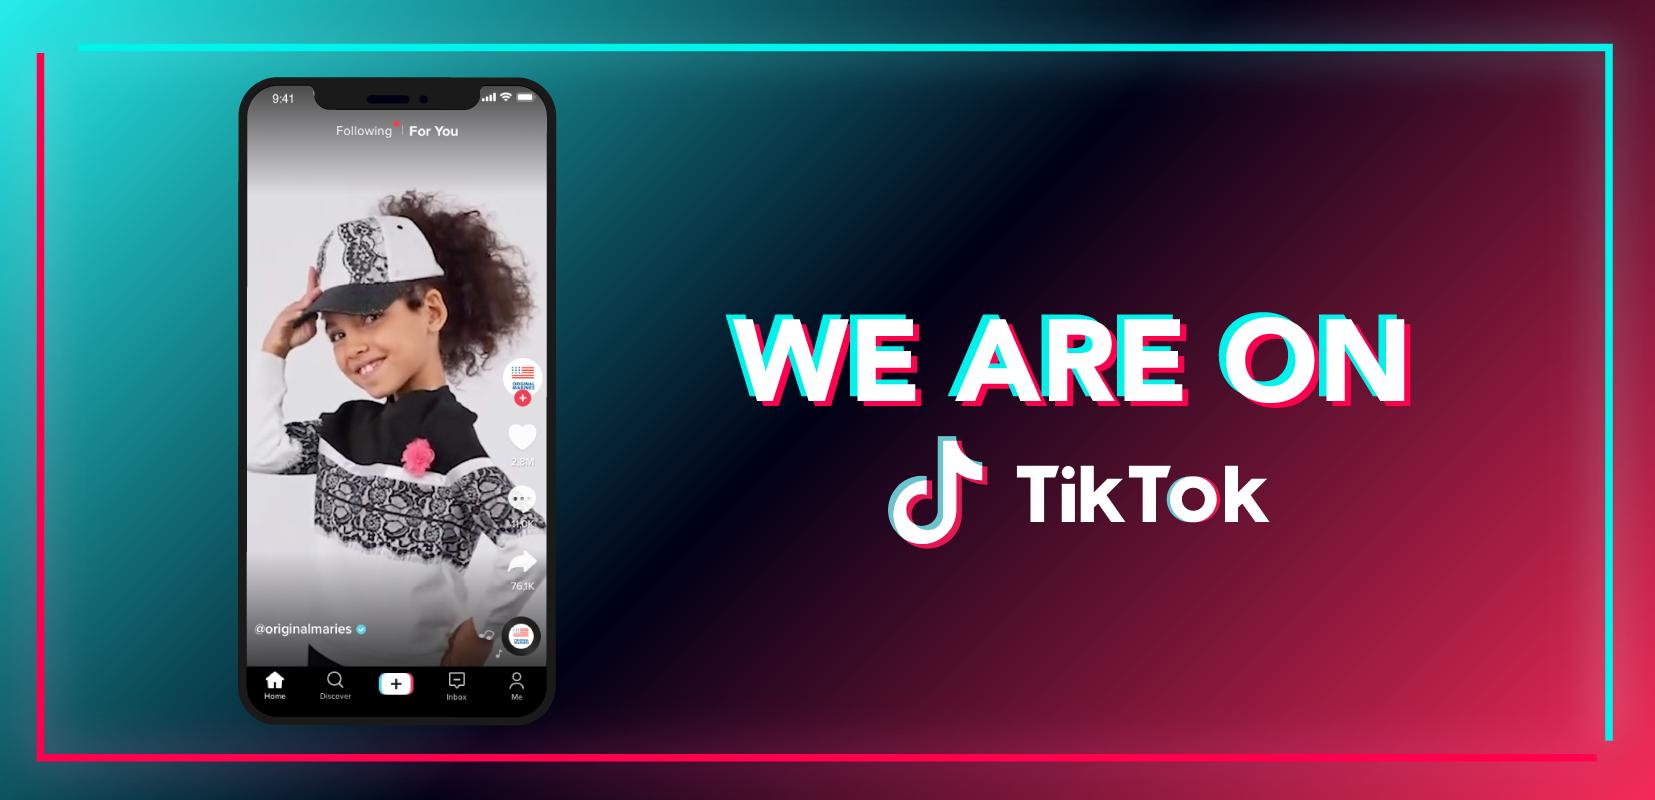 Tick tock, tick tock… it's time to let loose on TikTok.